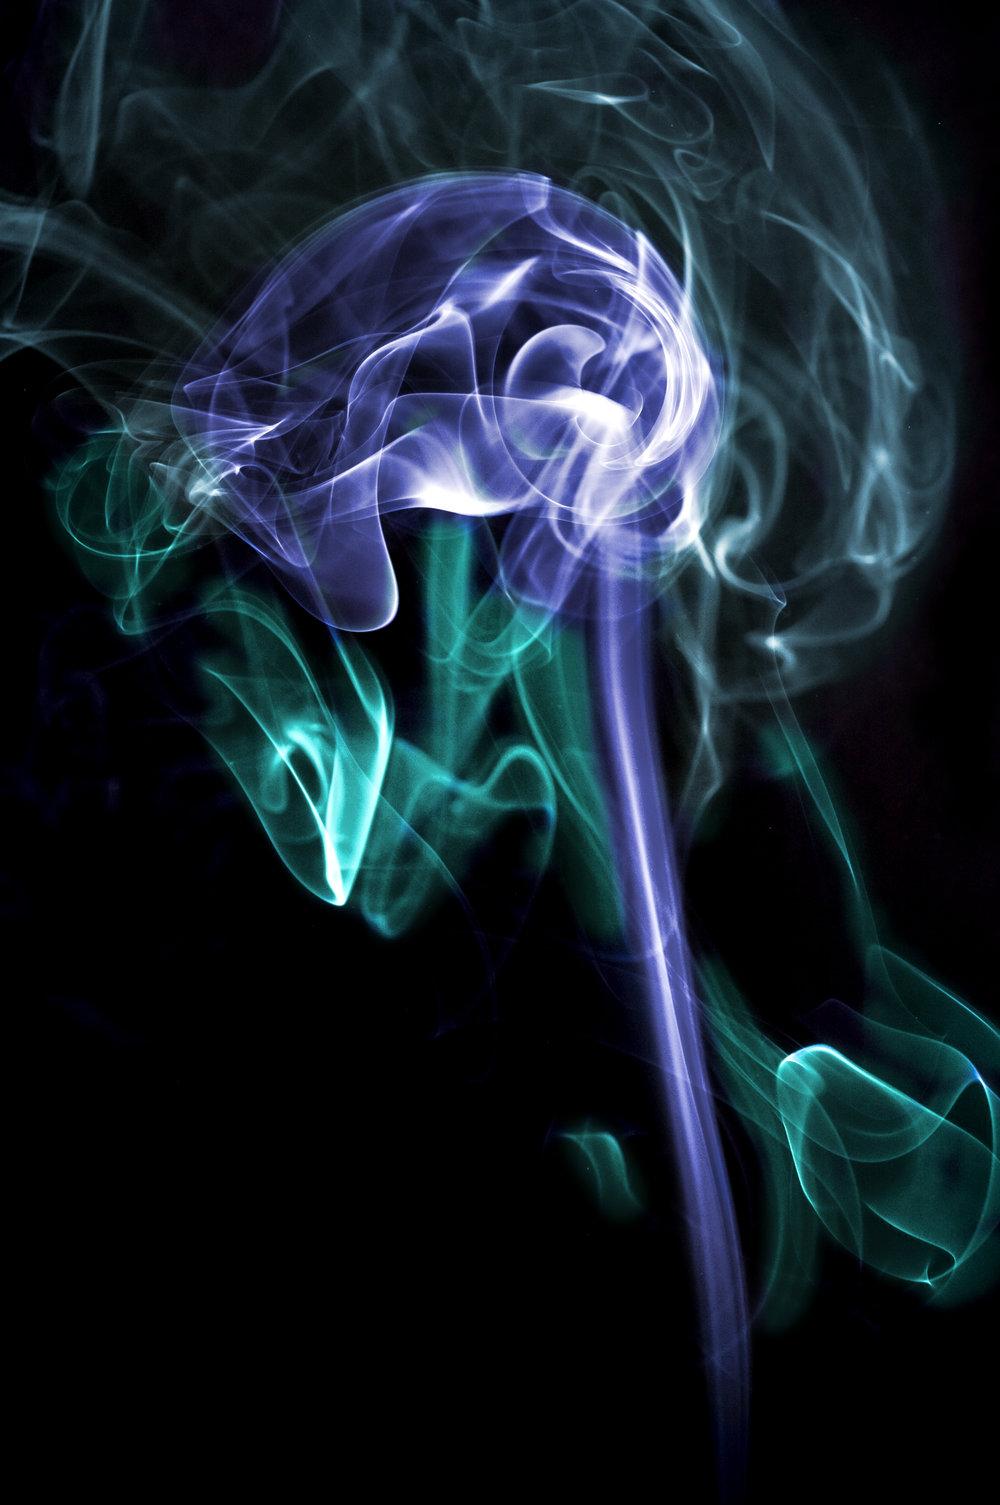 Smoke Photography -